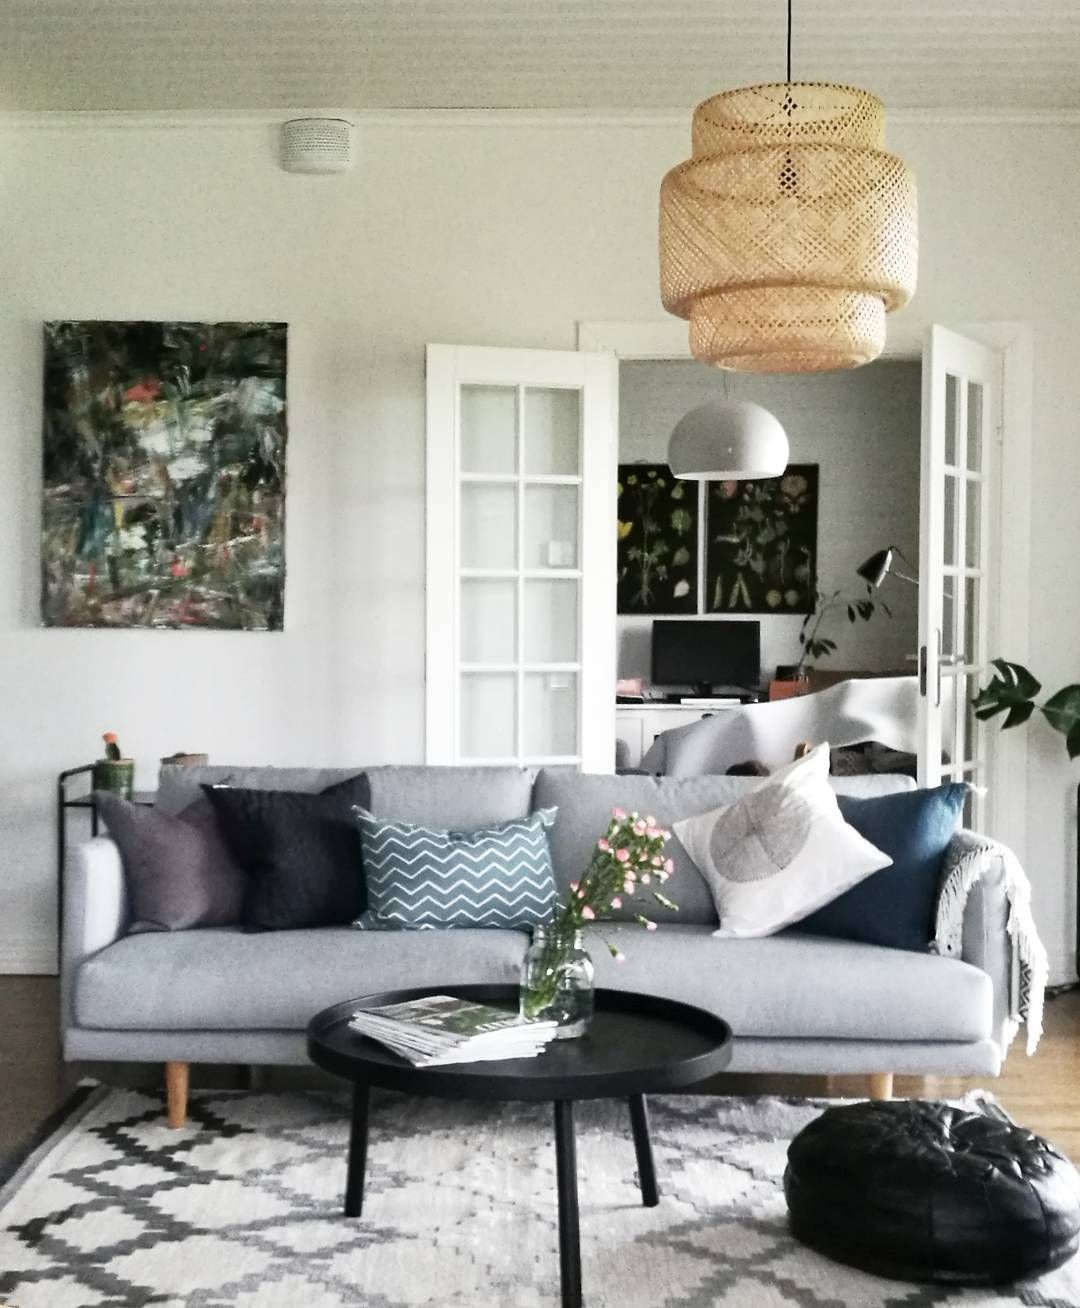 Ikea Sinnerlig Pendant Lamp Ig Callithomeblog Small